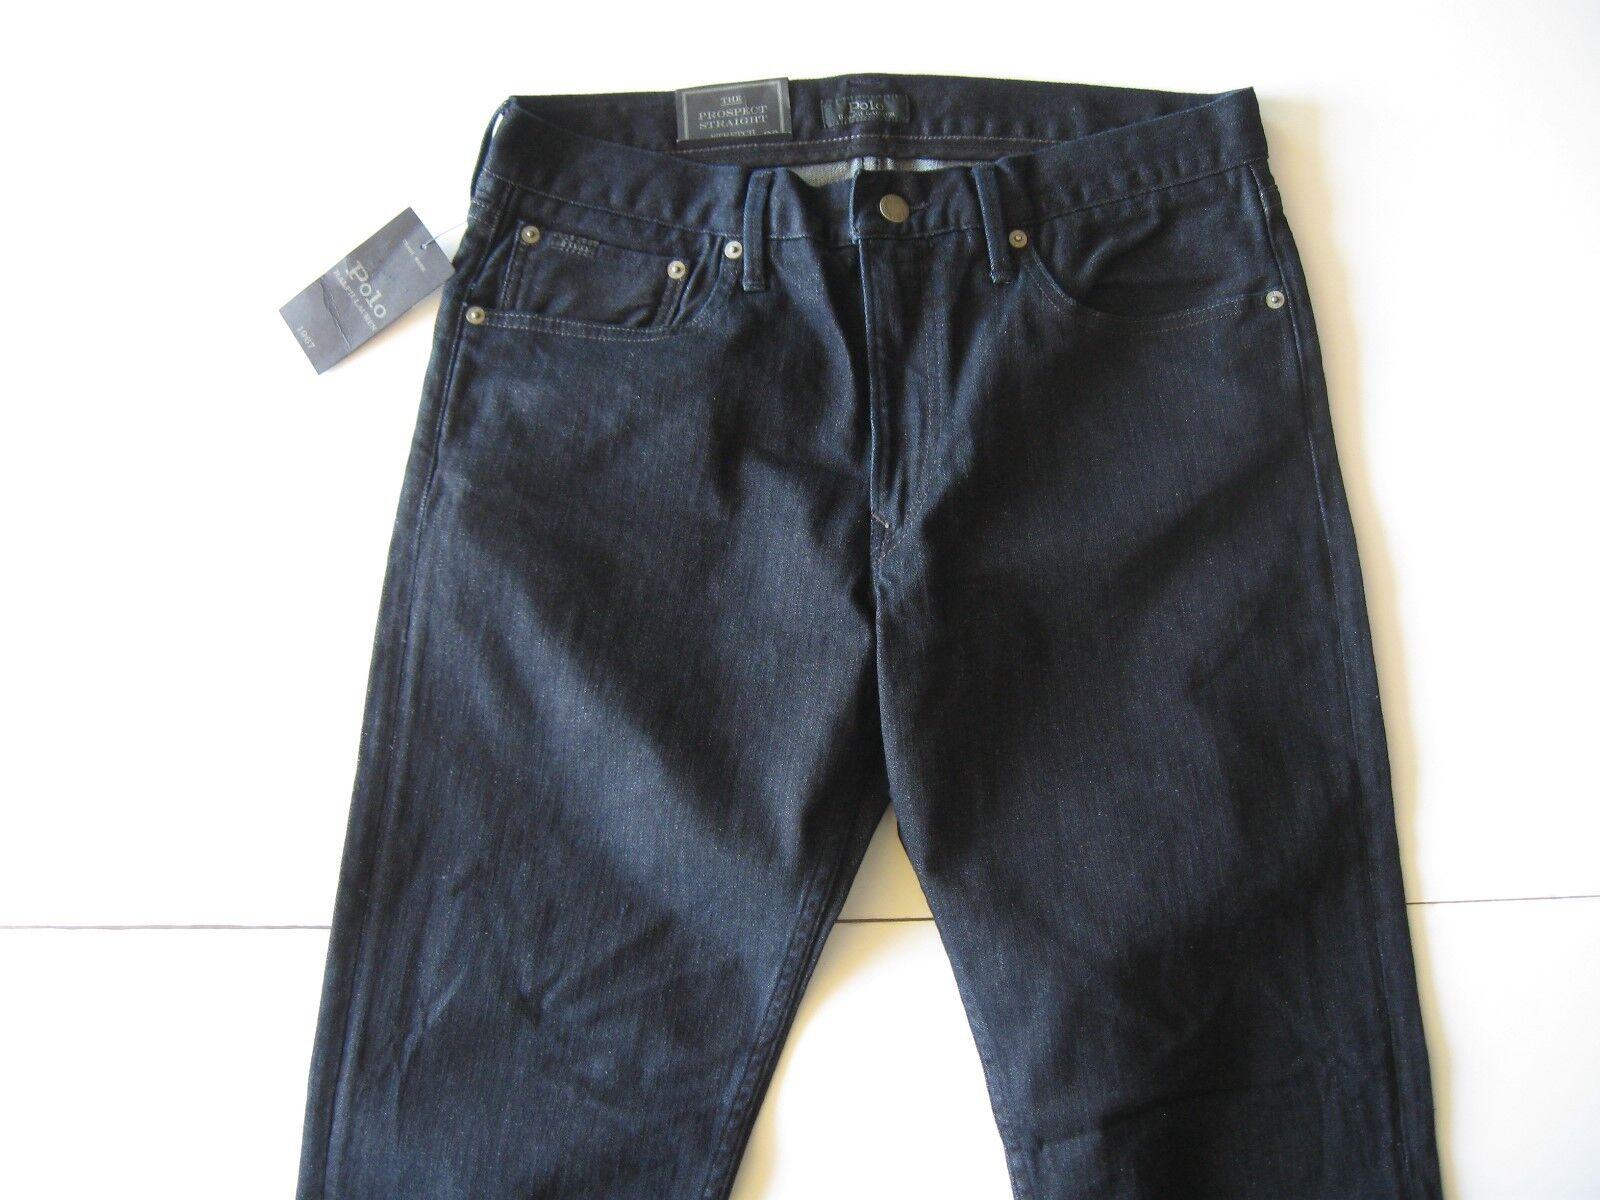 POLO RALPH LAUREN Men's Prospect Straight Dark Indigo Stretch Jeans 32x30